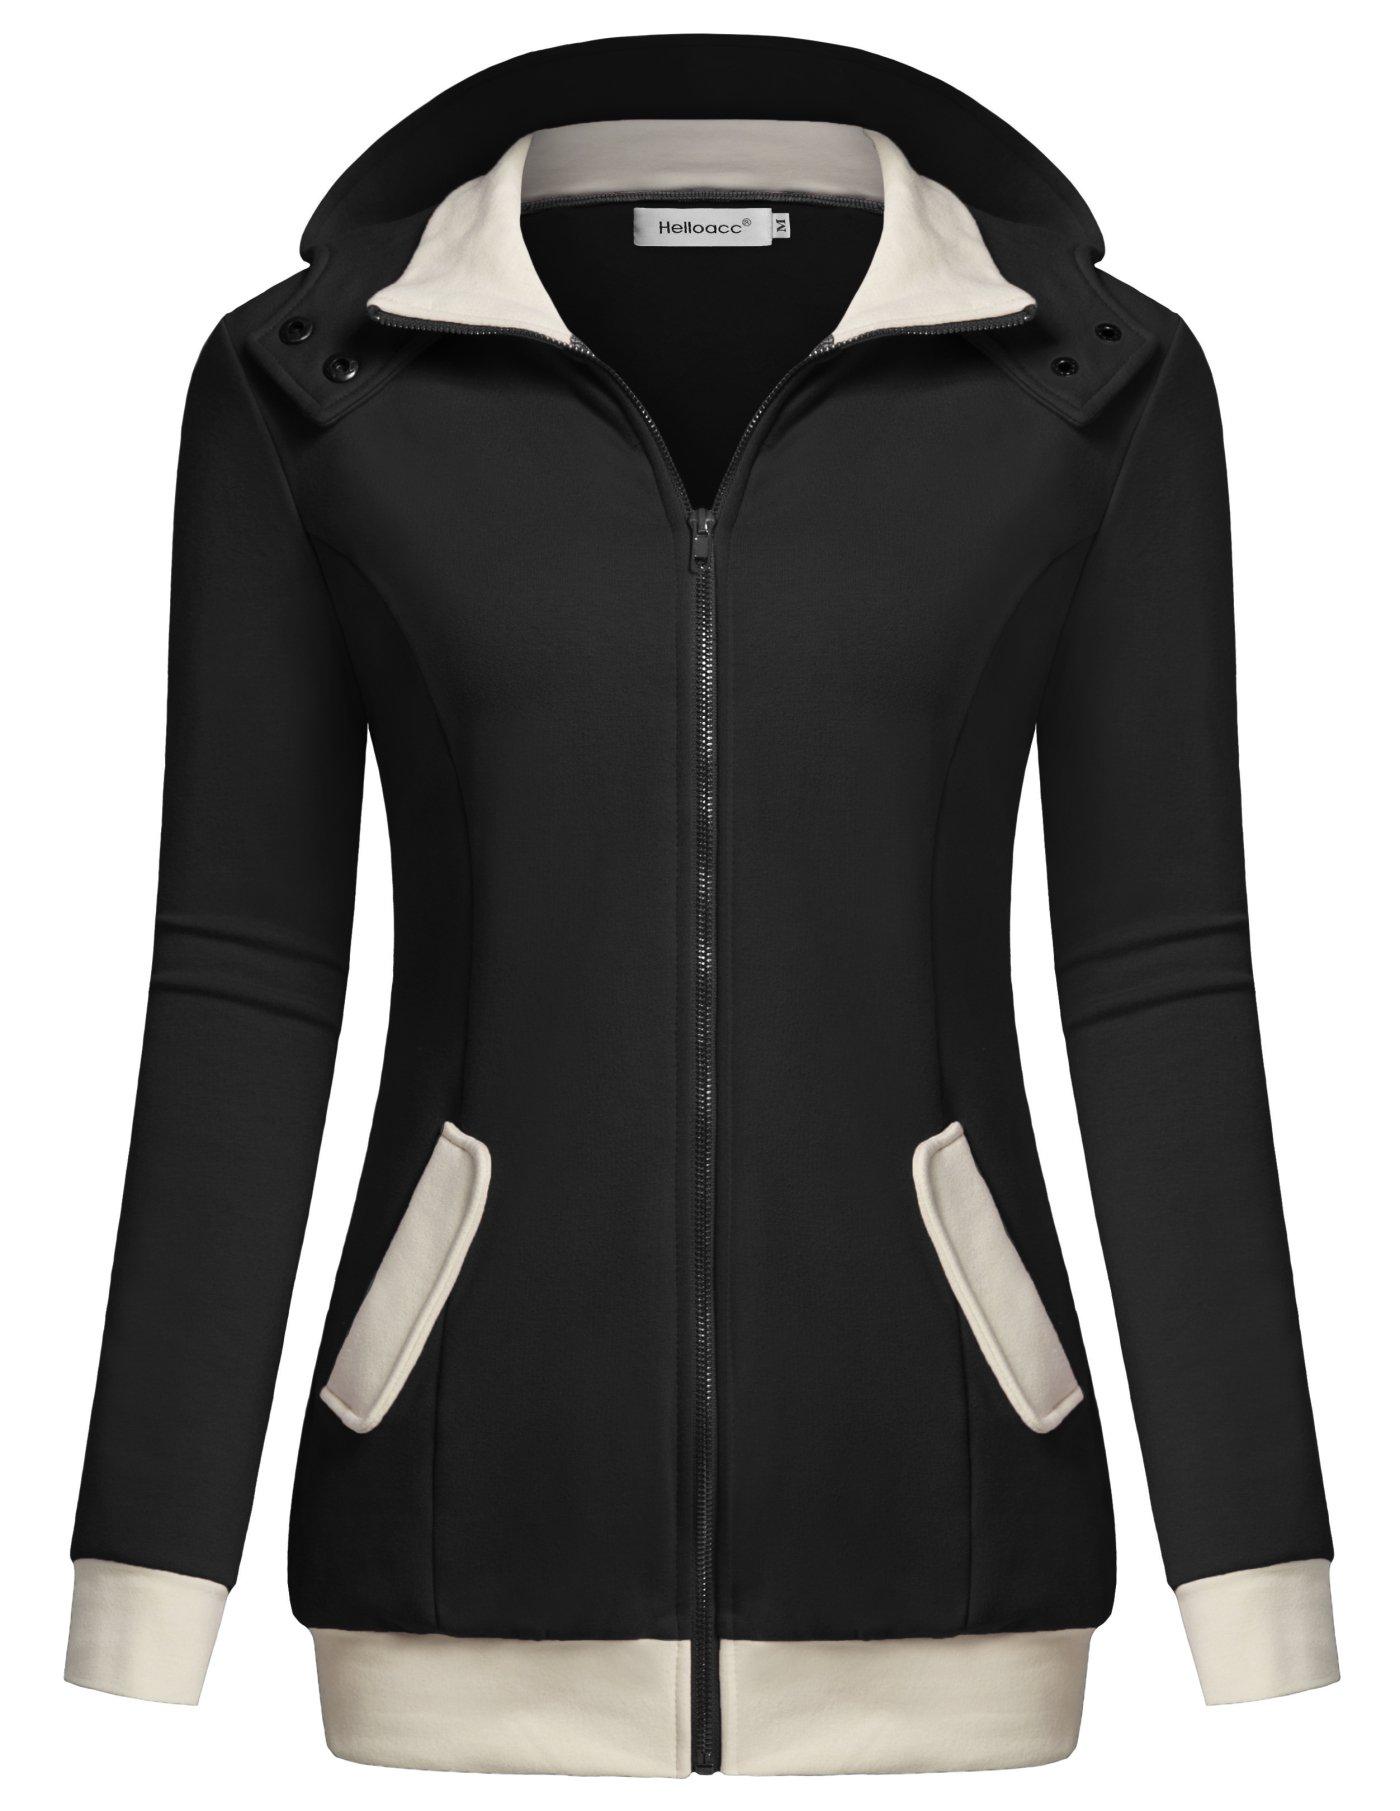 Helloacc Women Sweatshirts, Long Sleeves Coat Zipper Color Block Hoodies Black XL